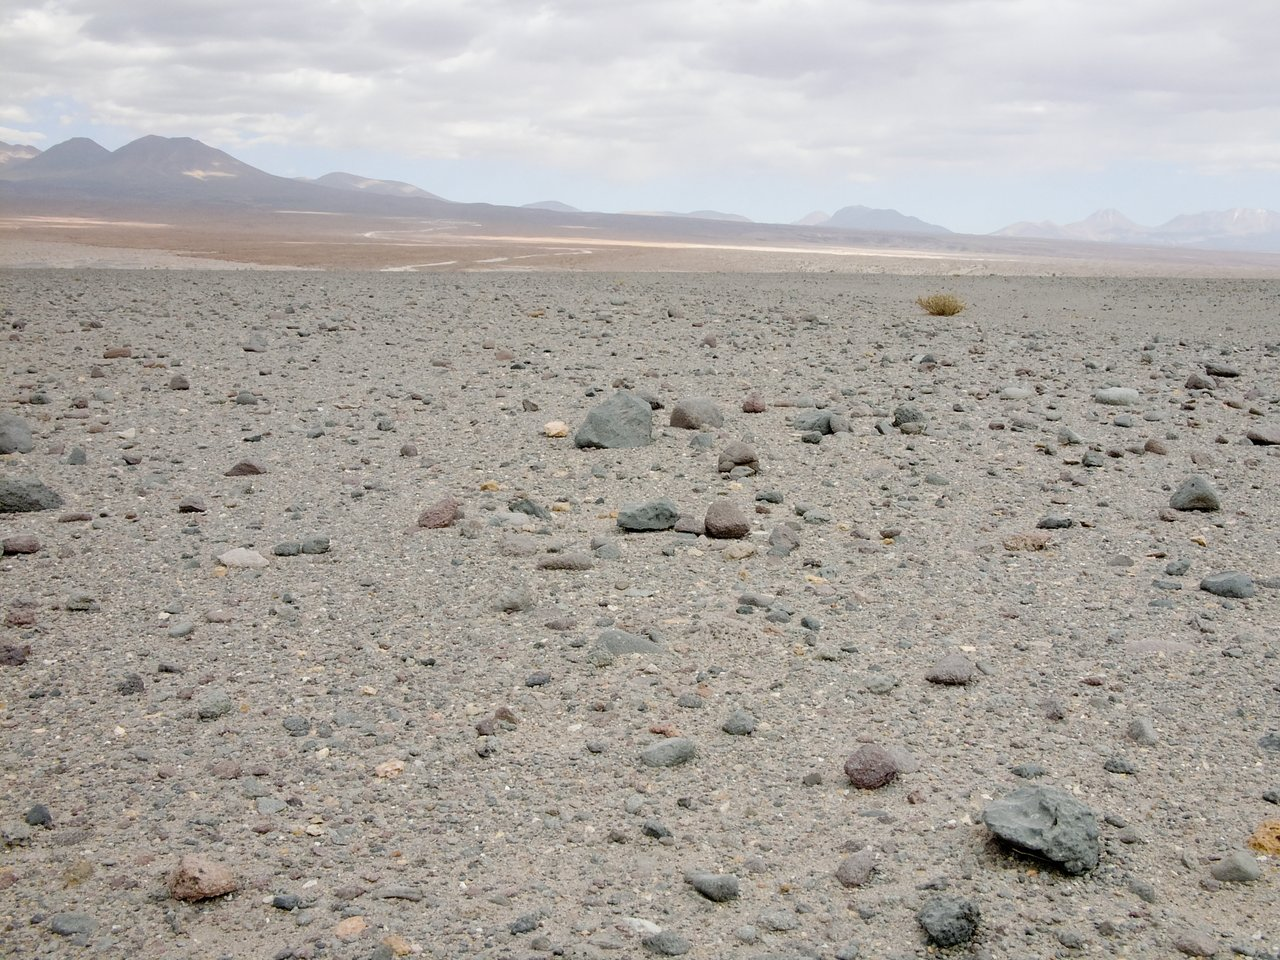 Mars-like landscape at the ALMA site